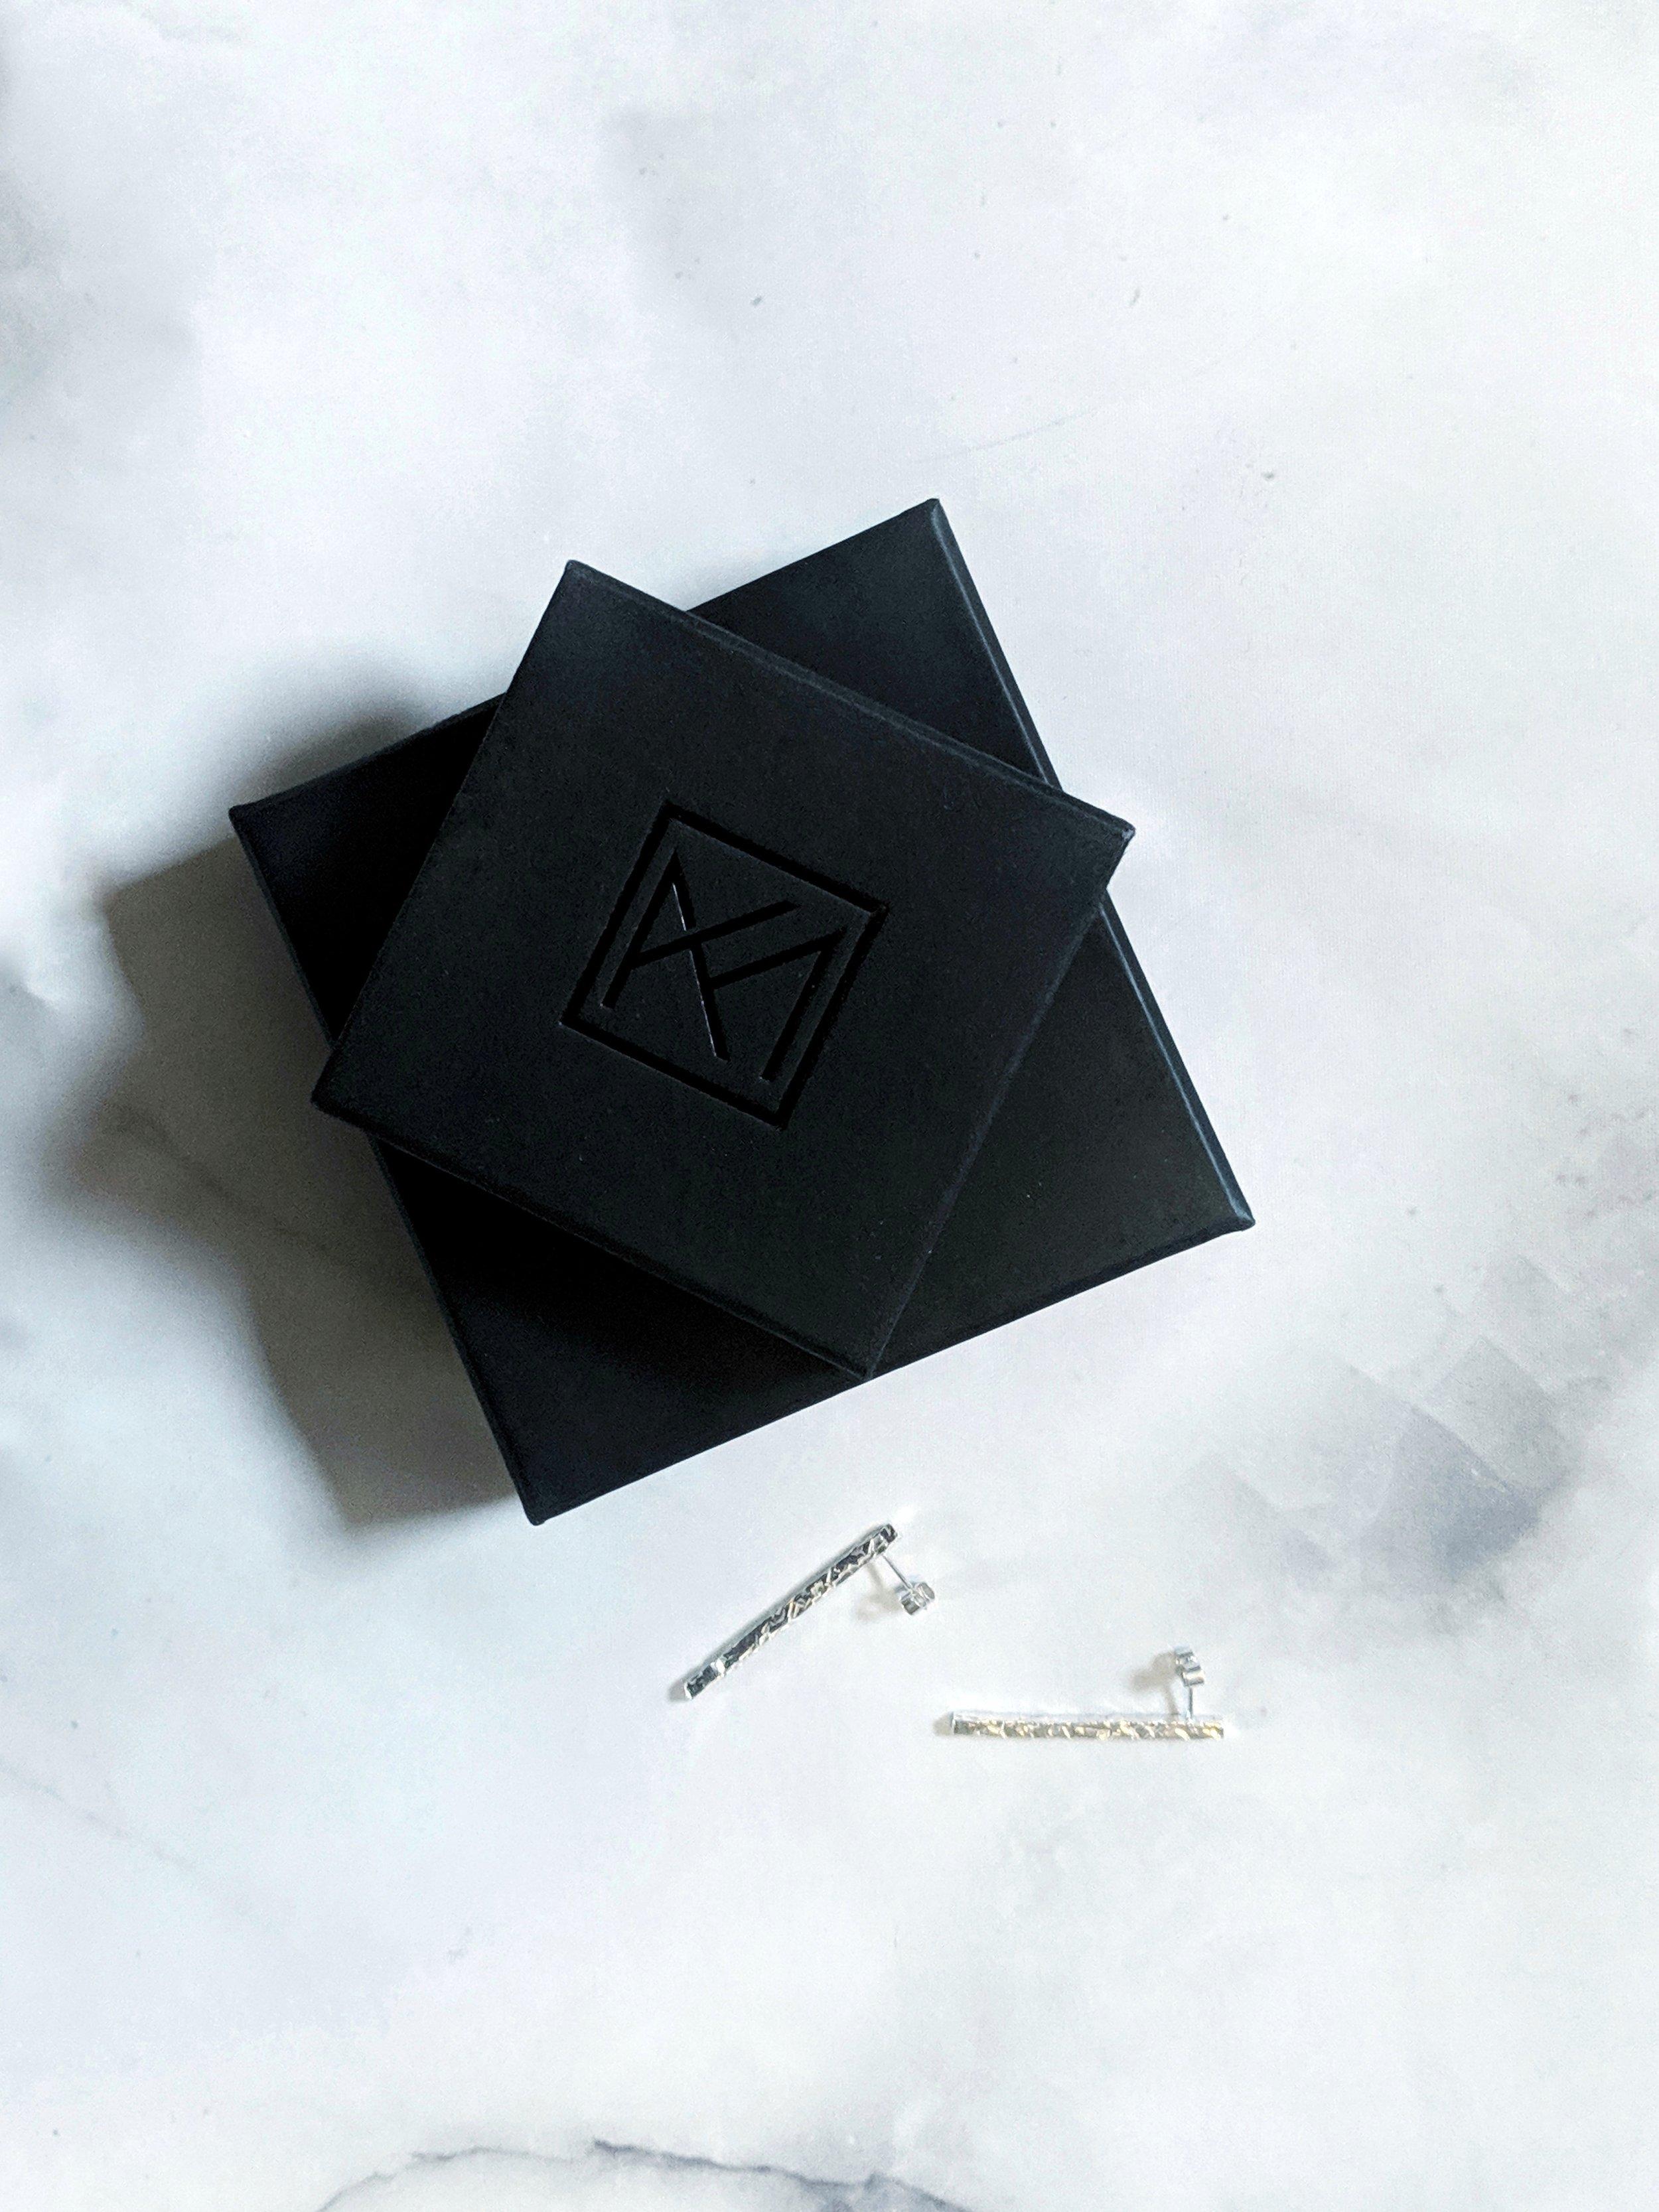 Kirsten Manzi Jewellery - Minimal Silver Earrings and Packaging.jpeg